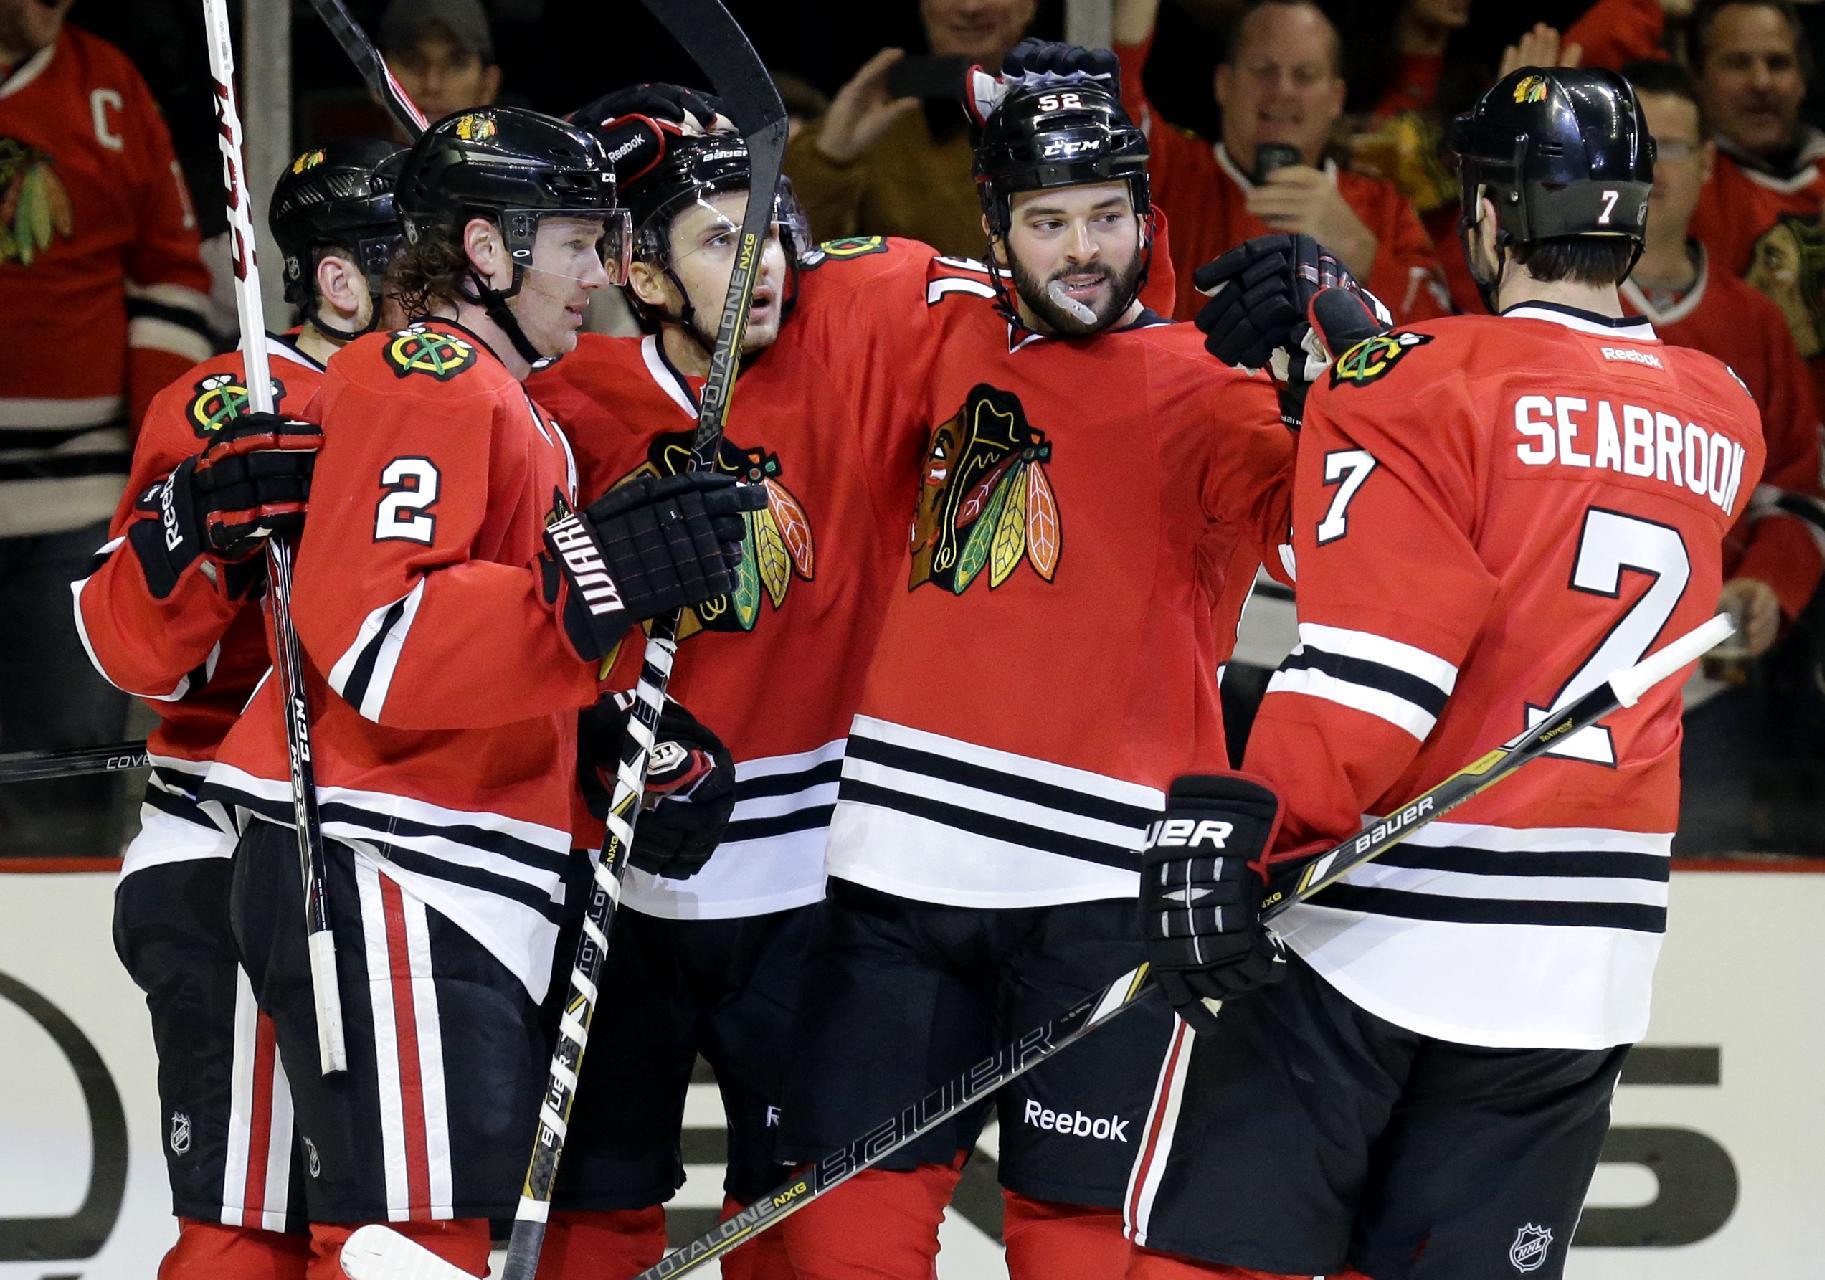 Kane scores in SO as Blackhawks top Bruins 3-2